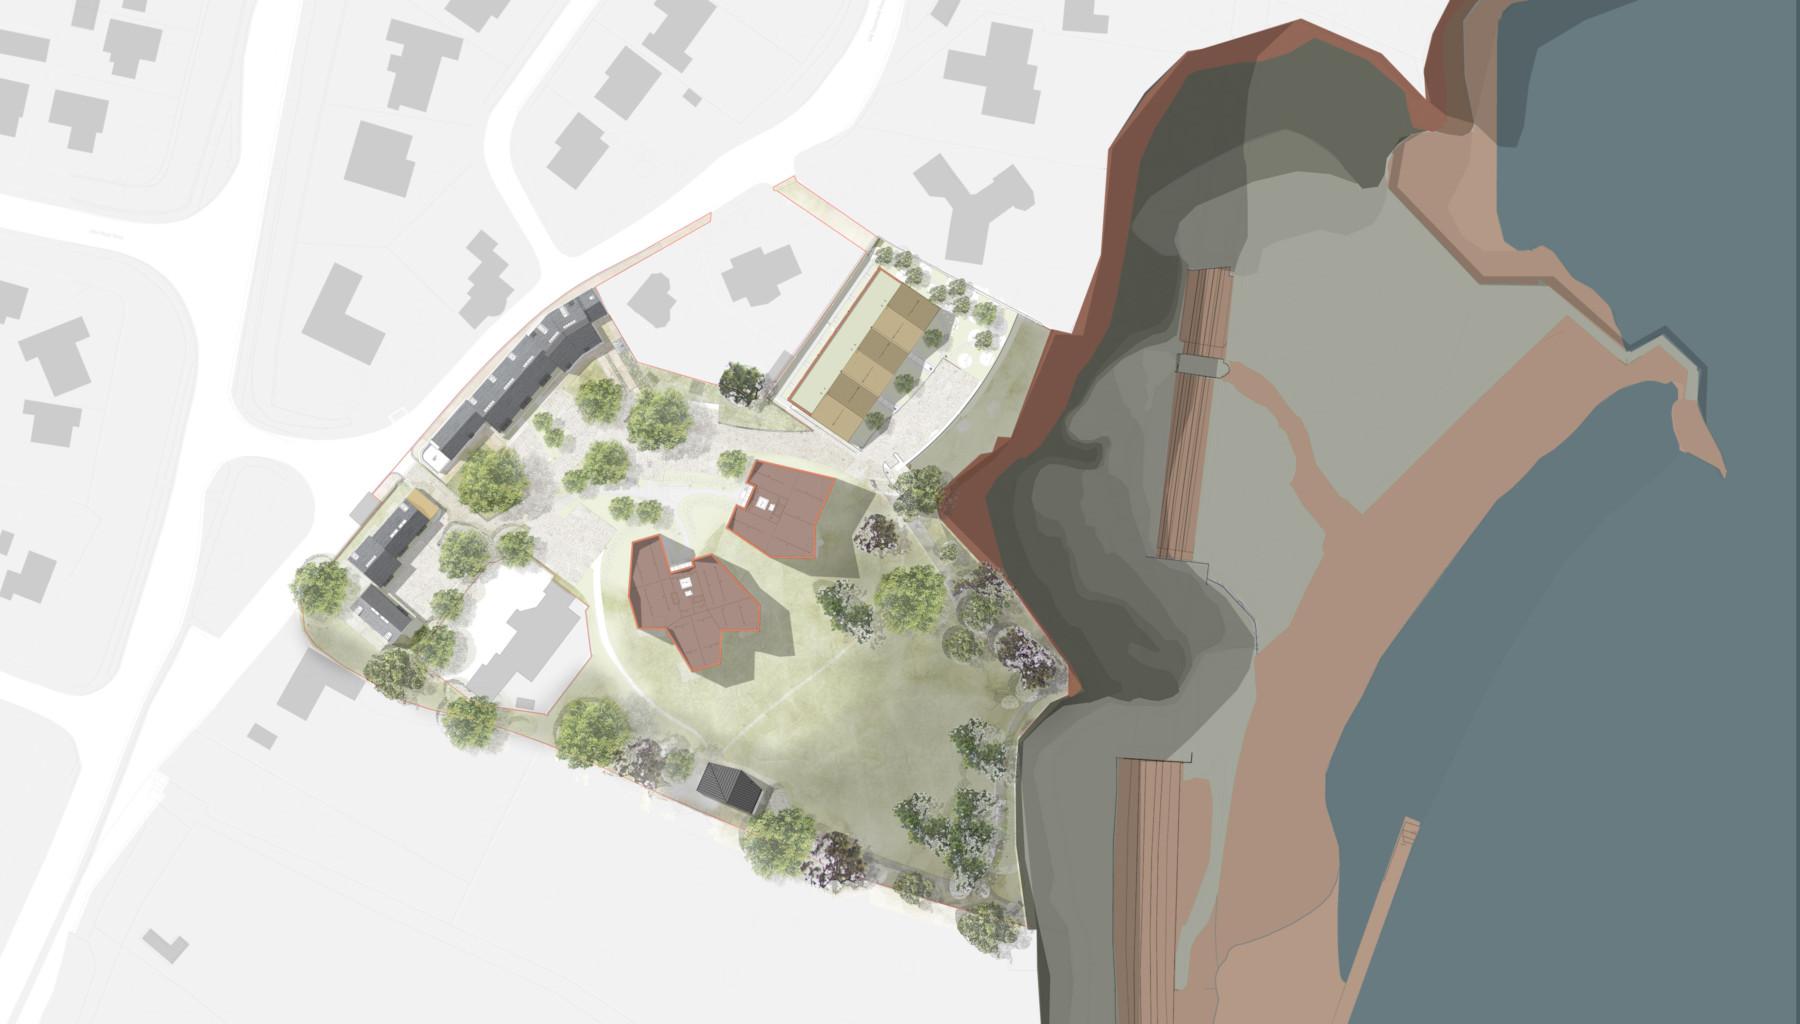 Sarah-Wigglesworth-Architects Shell-Cove Site Plan 3600